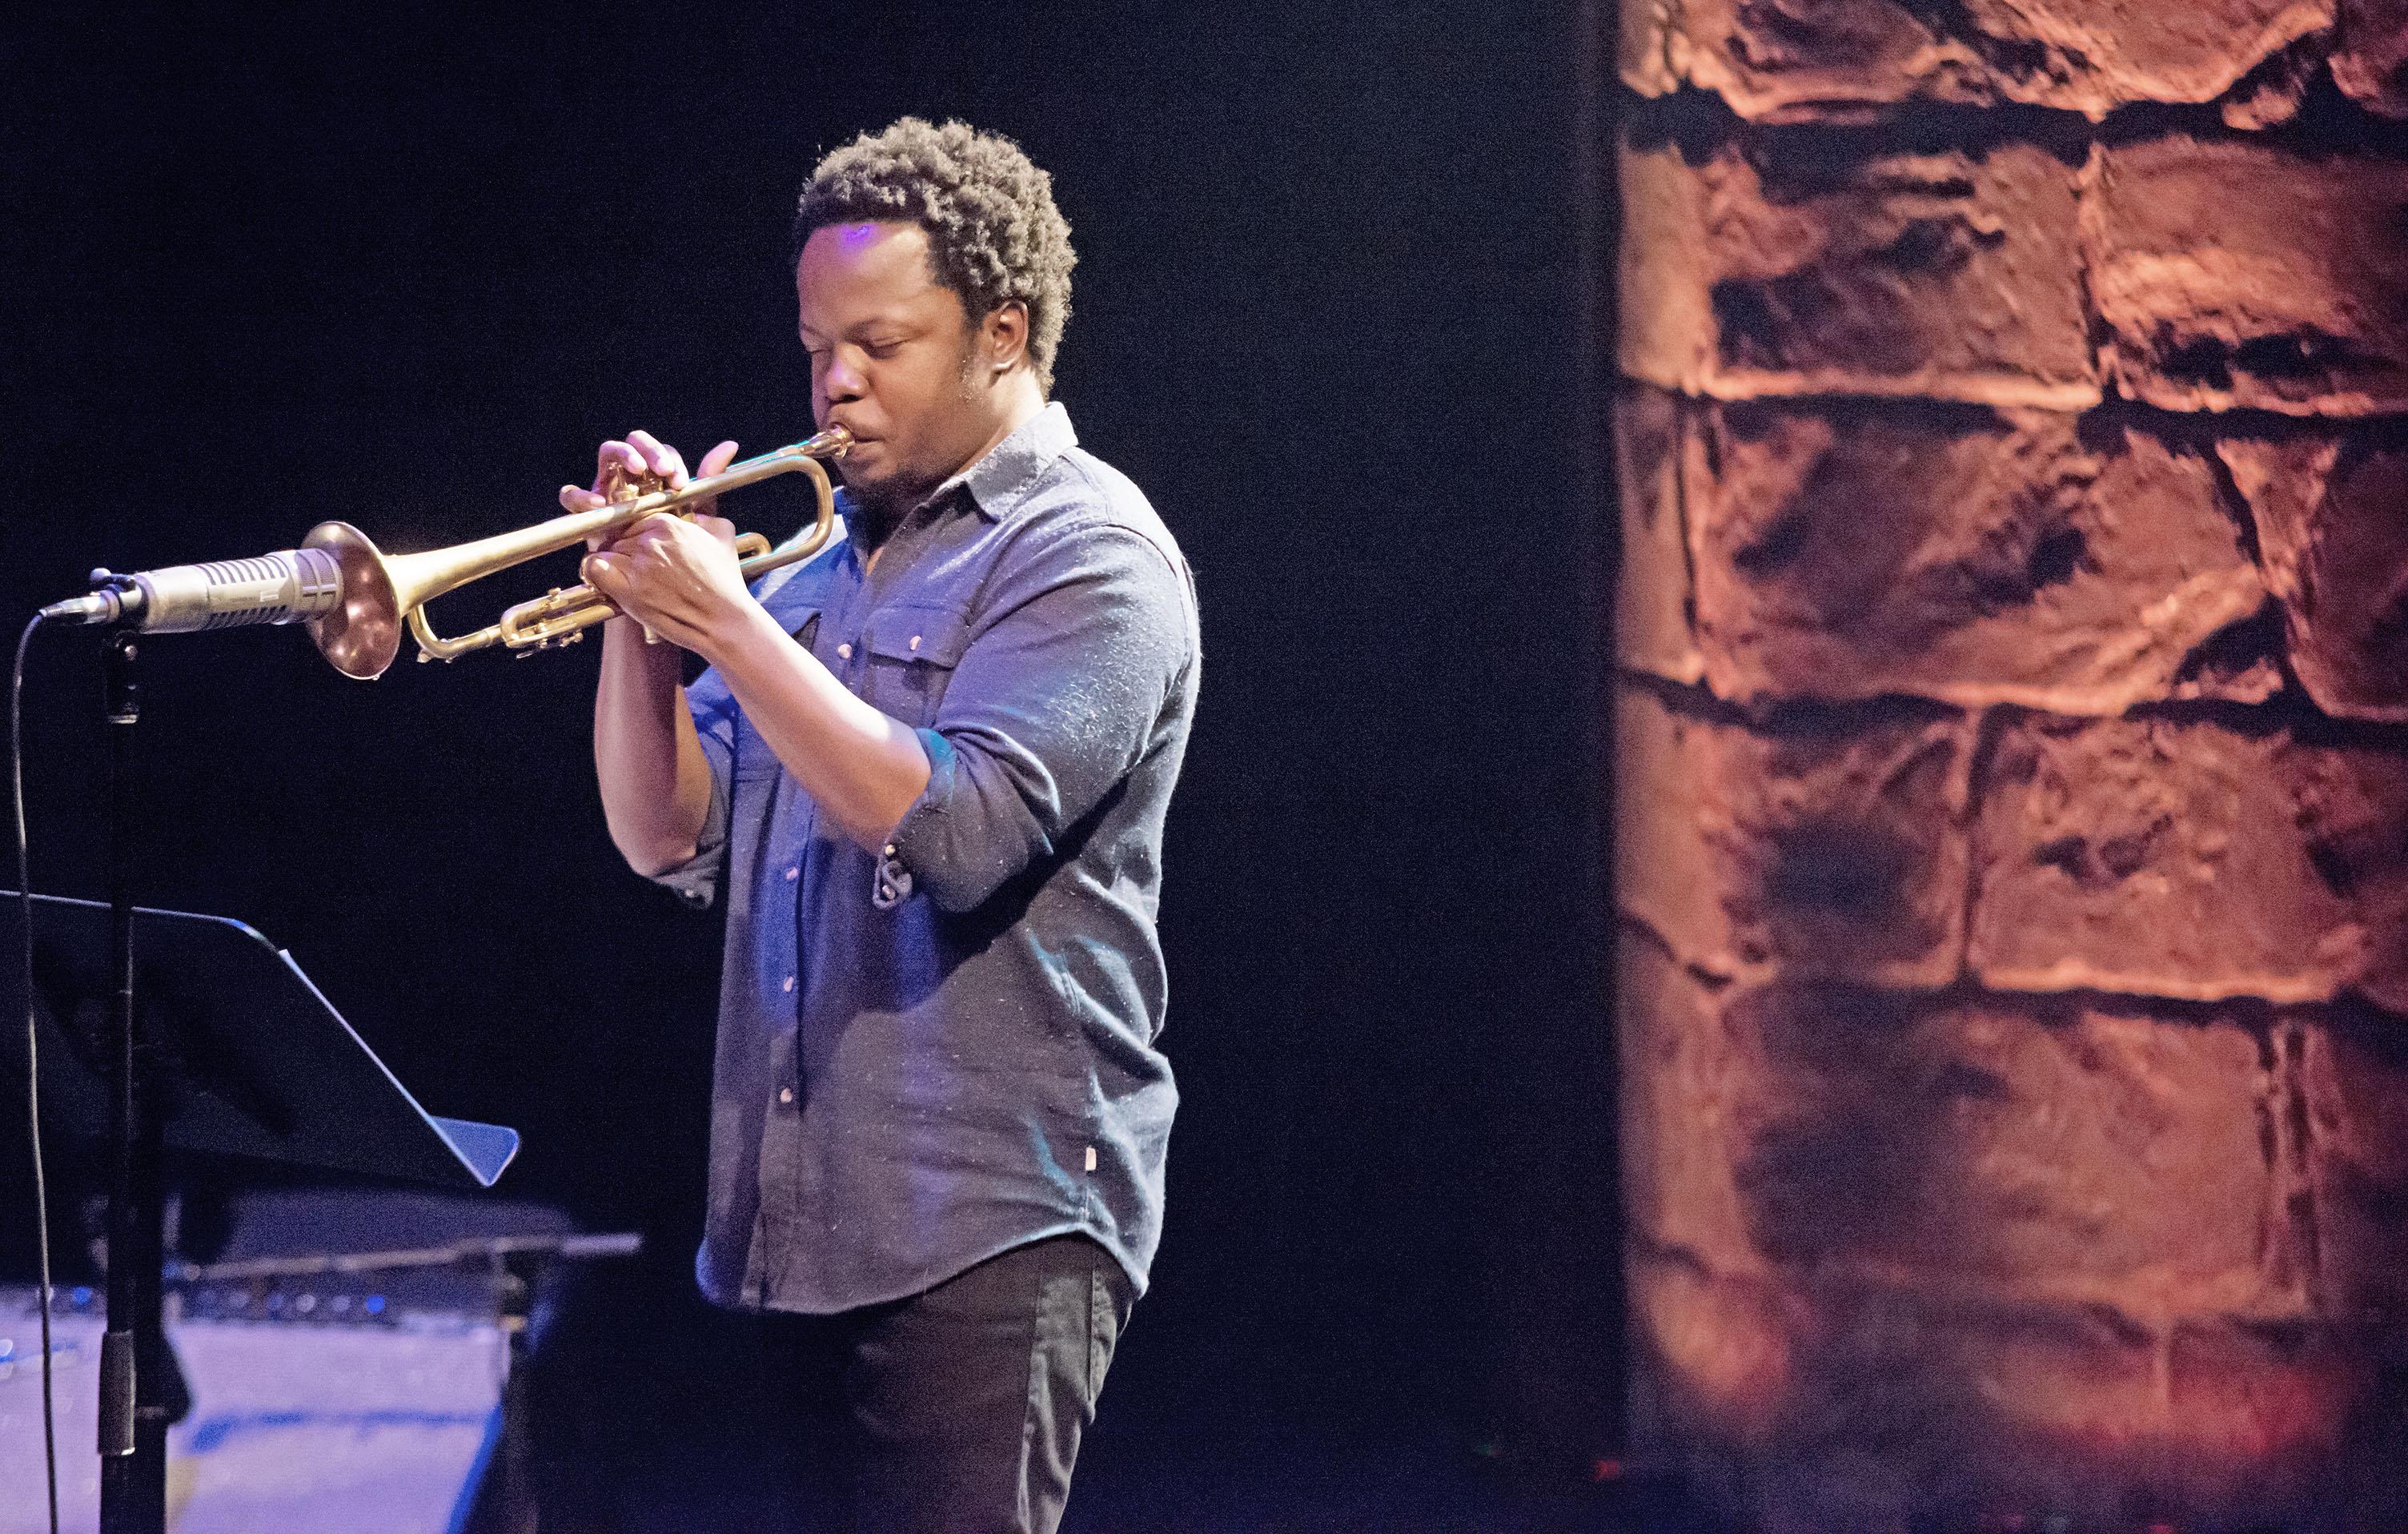 Ambrose Akinmusire & Bill Frisell at 2014 Festival International de Jazz de Montréal